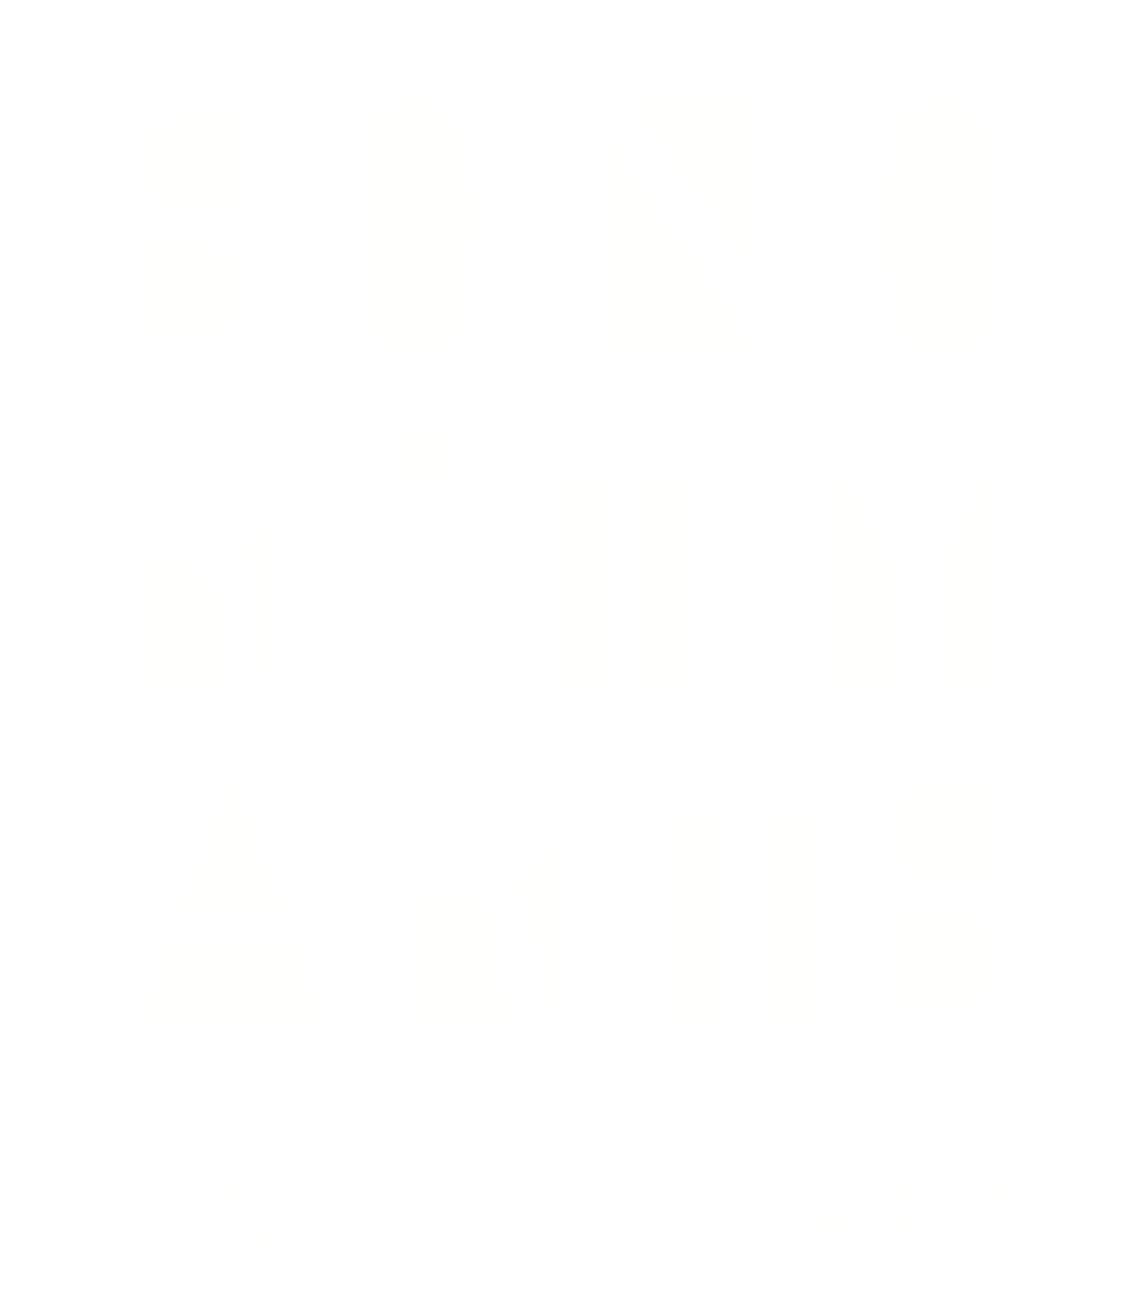 sonority arts